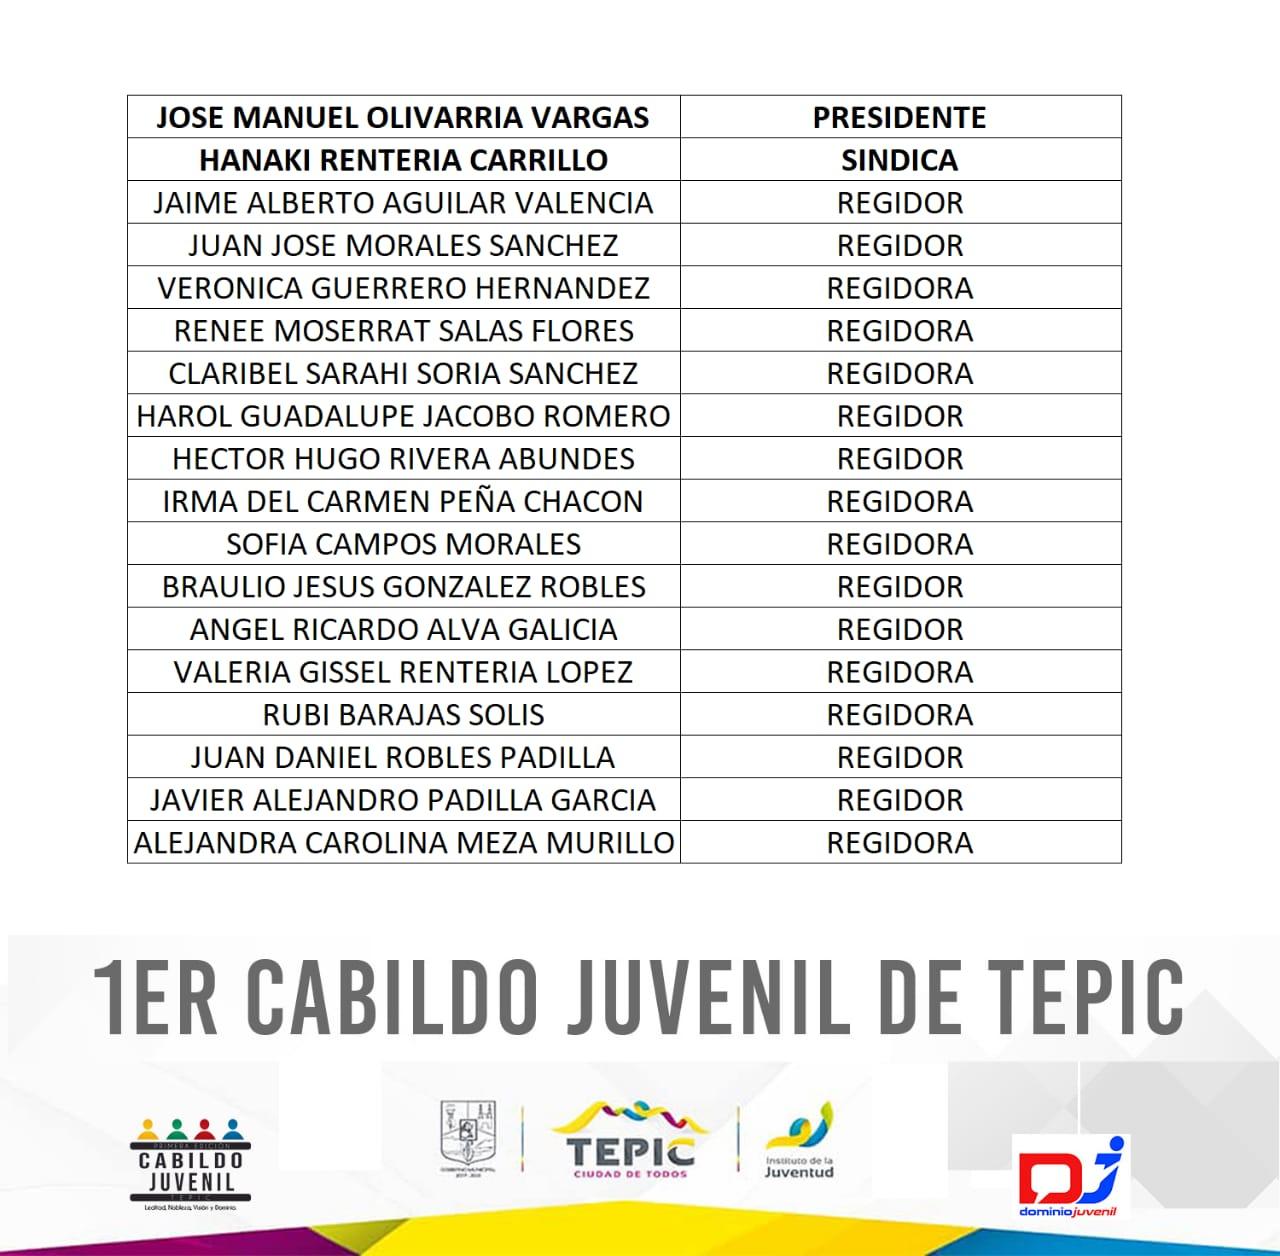 primer_cabildo_juvenil